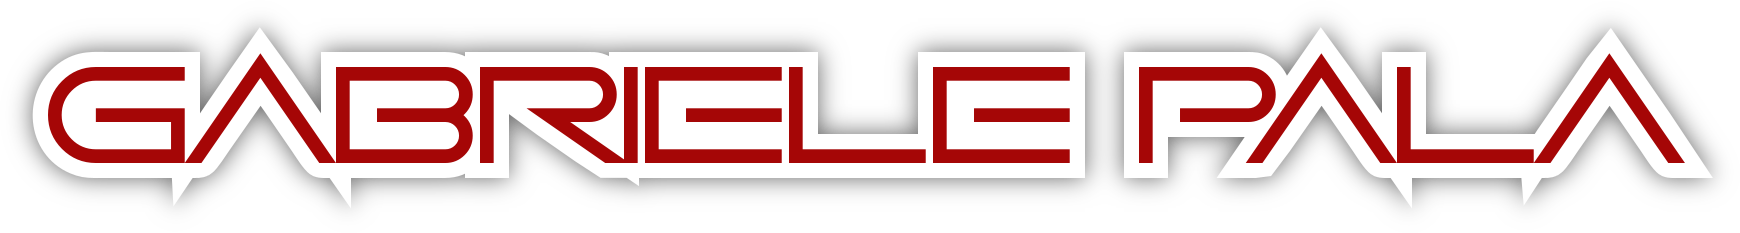 Gabriele Pala Logo